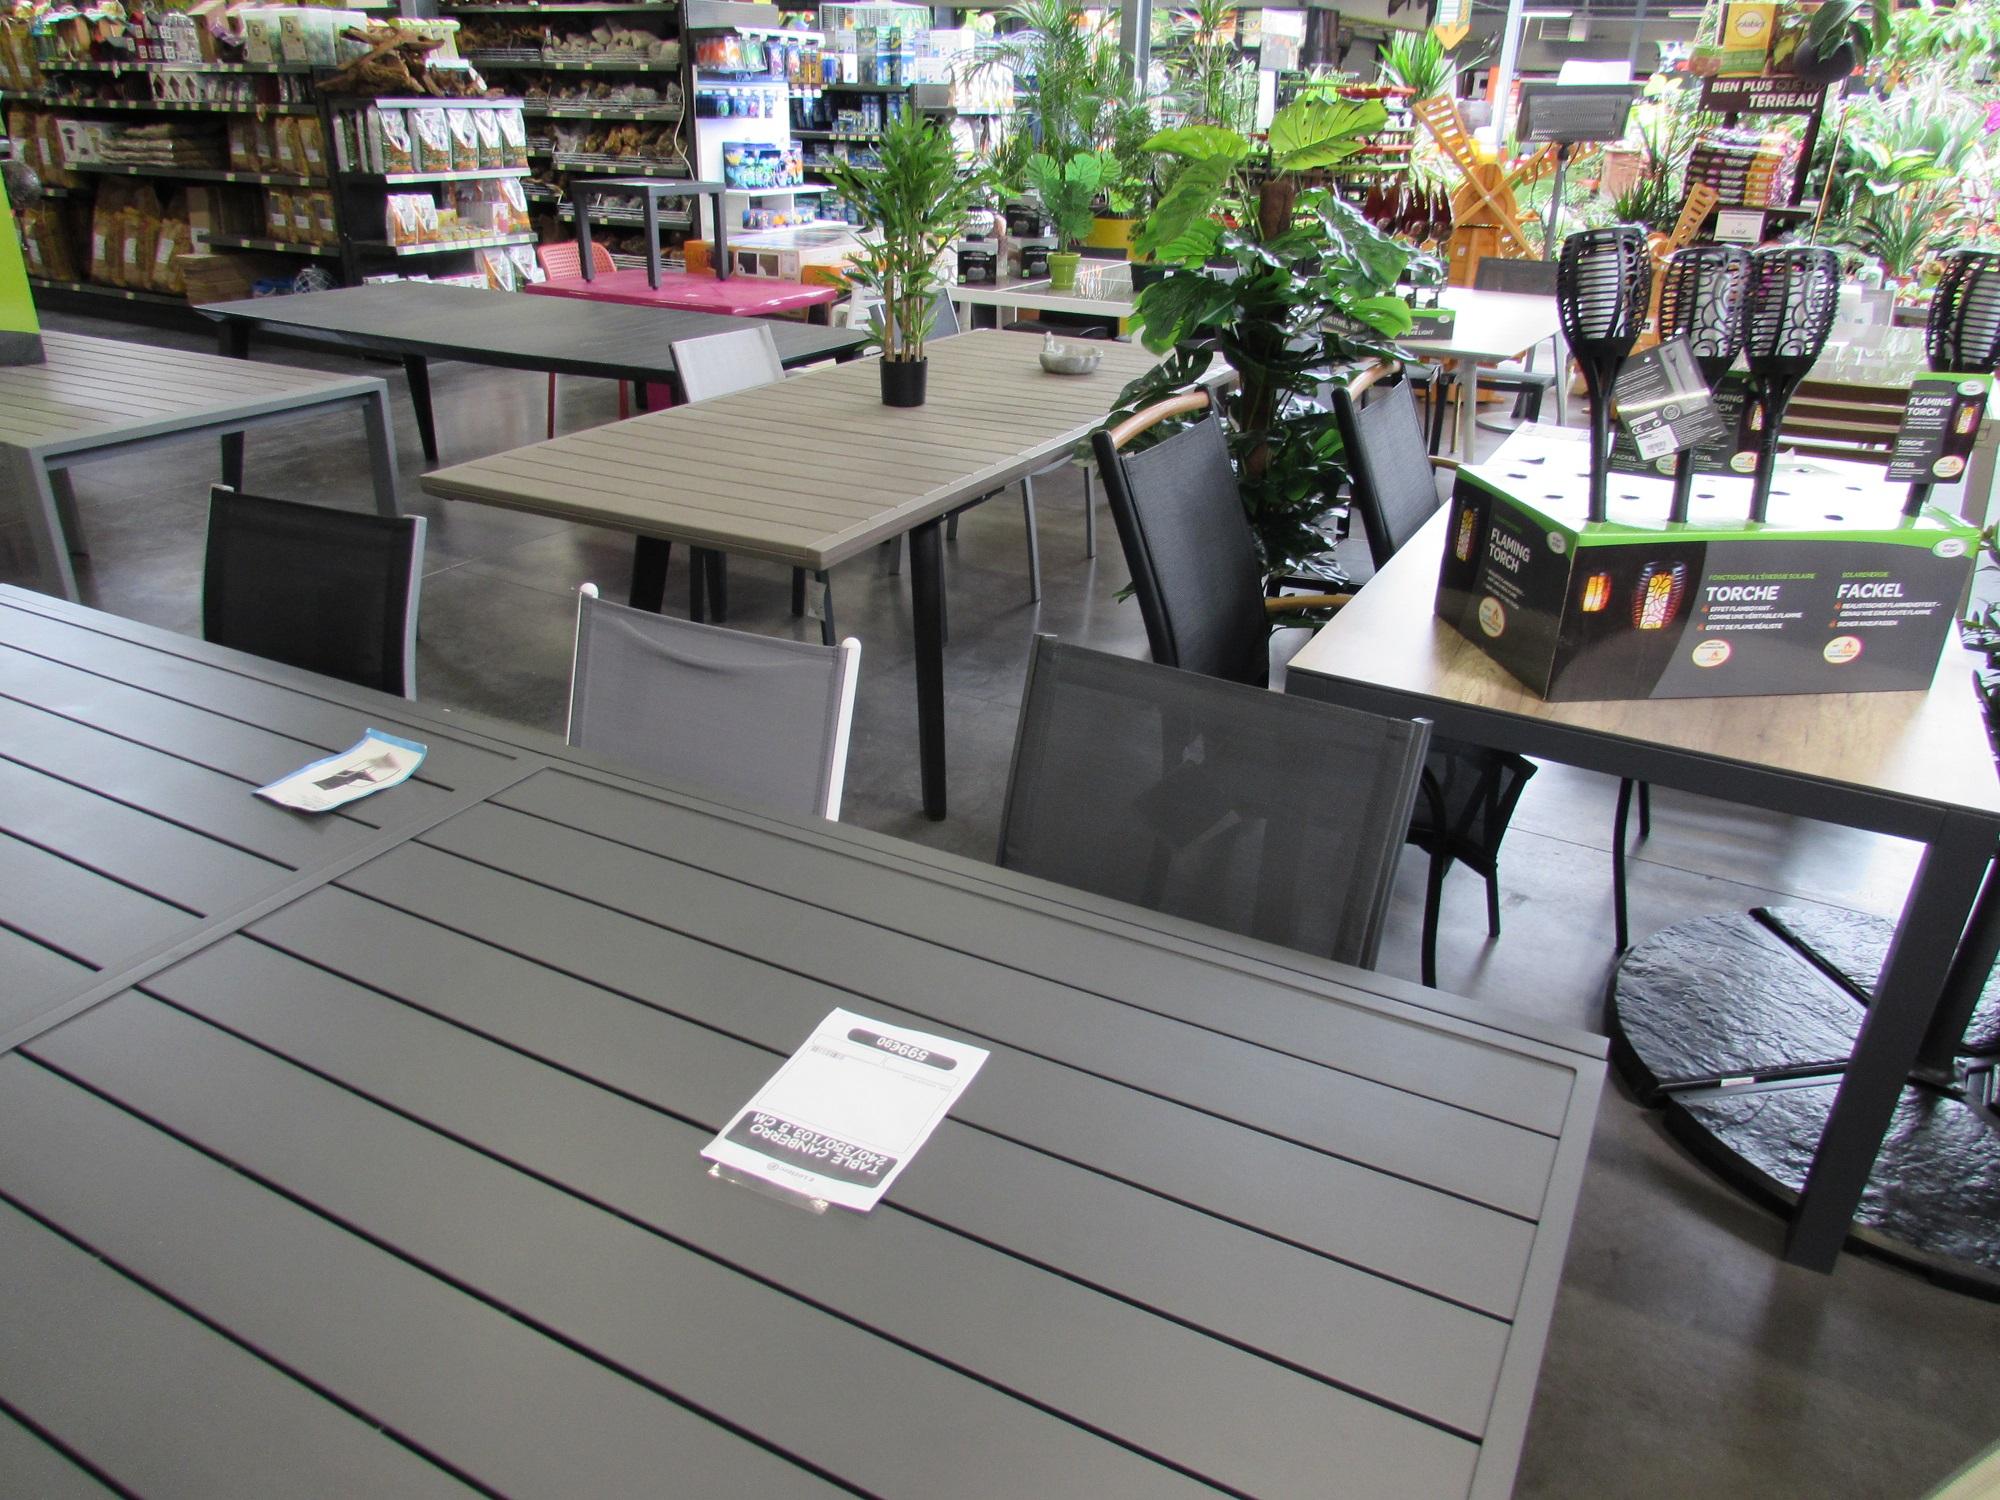 Jardi-Animalerie E. Leclerc - Longeville En Barrois - 55000 ... avec Table De Jardin Magasin Leclerc